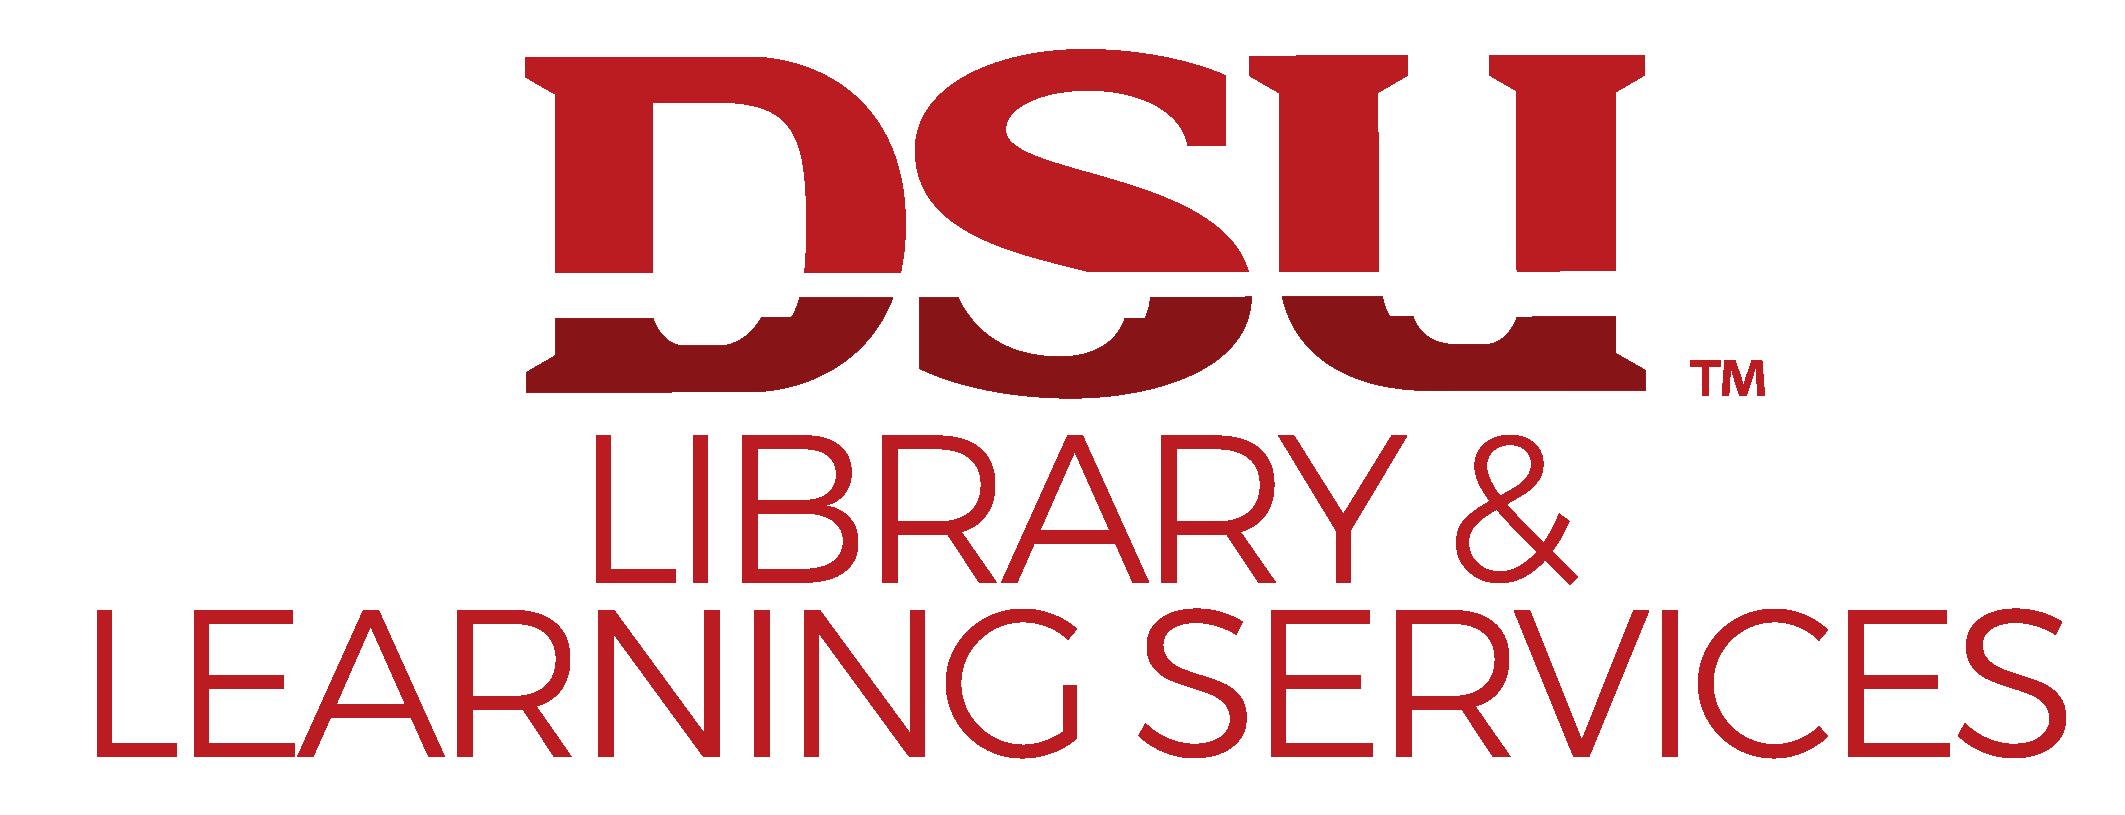 dsu library services